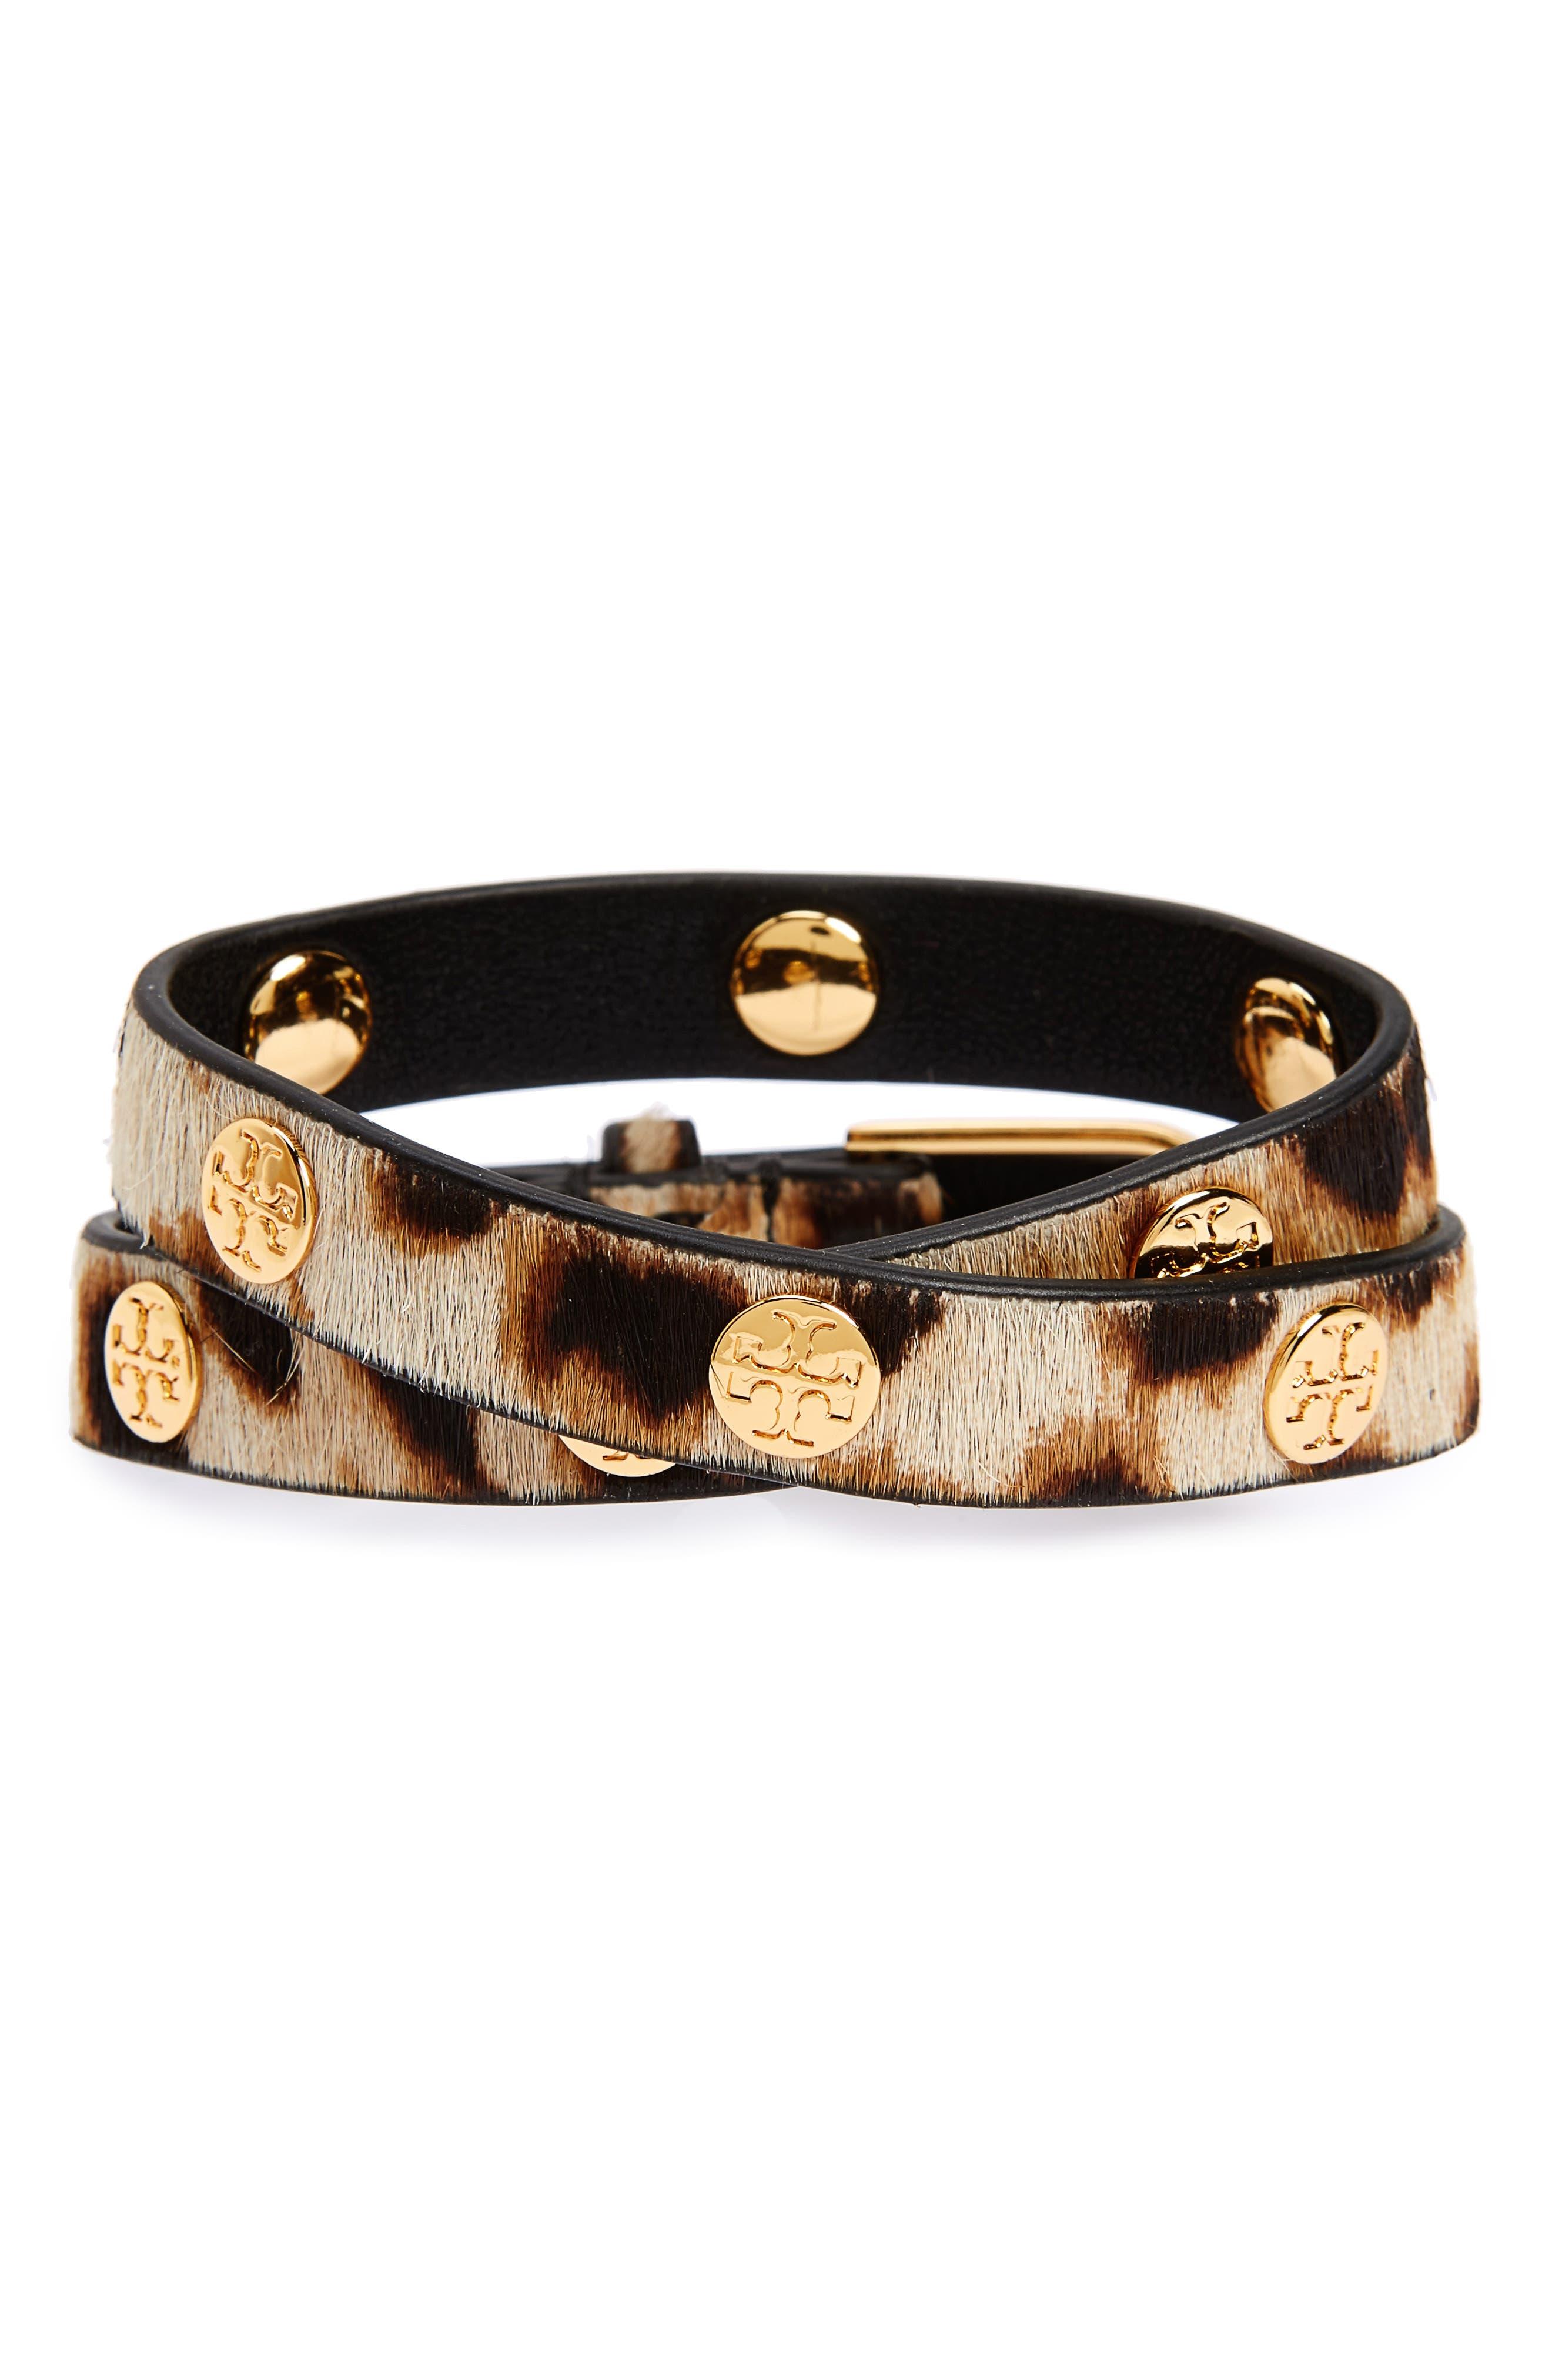 Tory Burch Genuine Calf Hair Wrap Bracelet